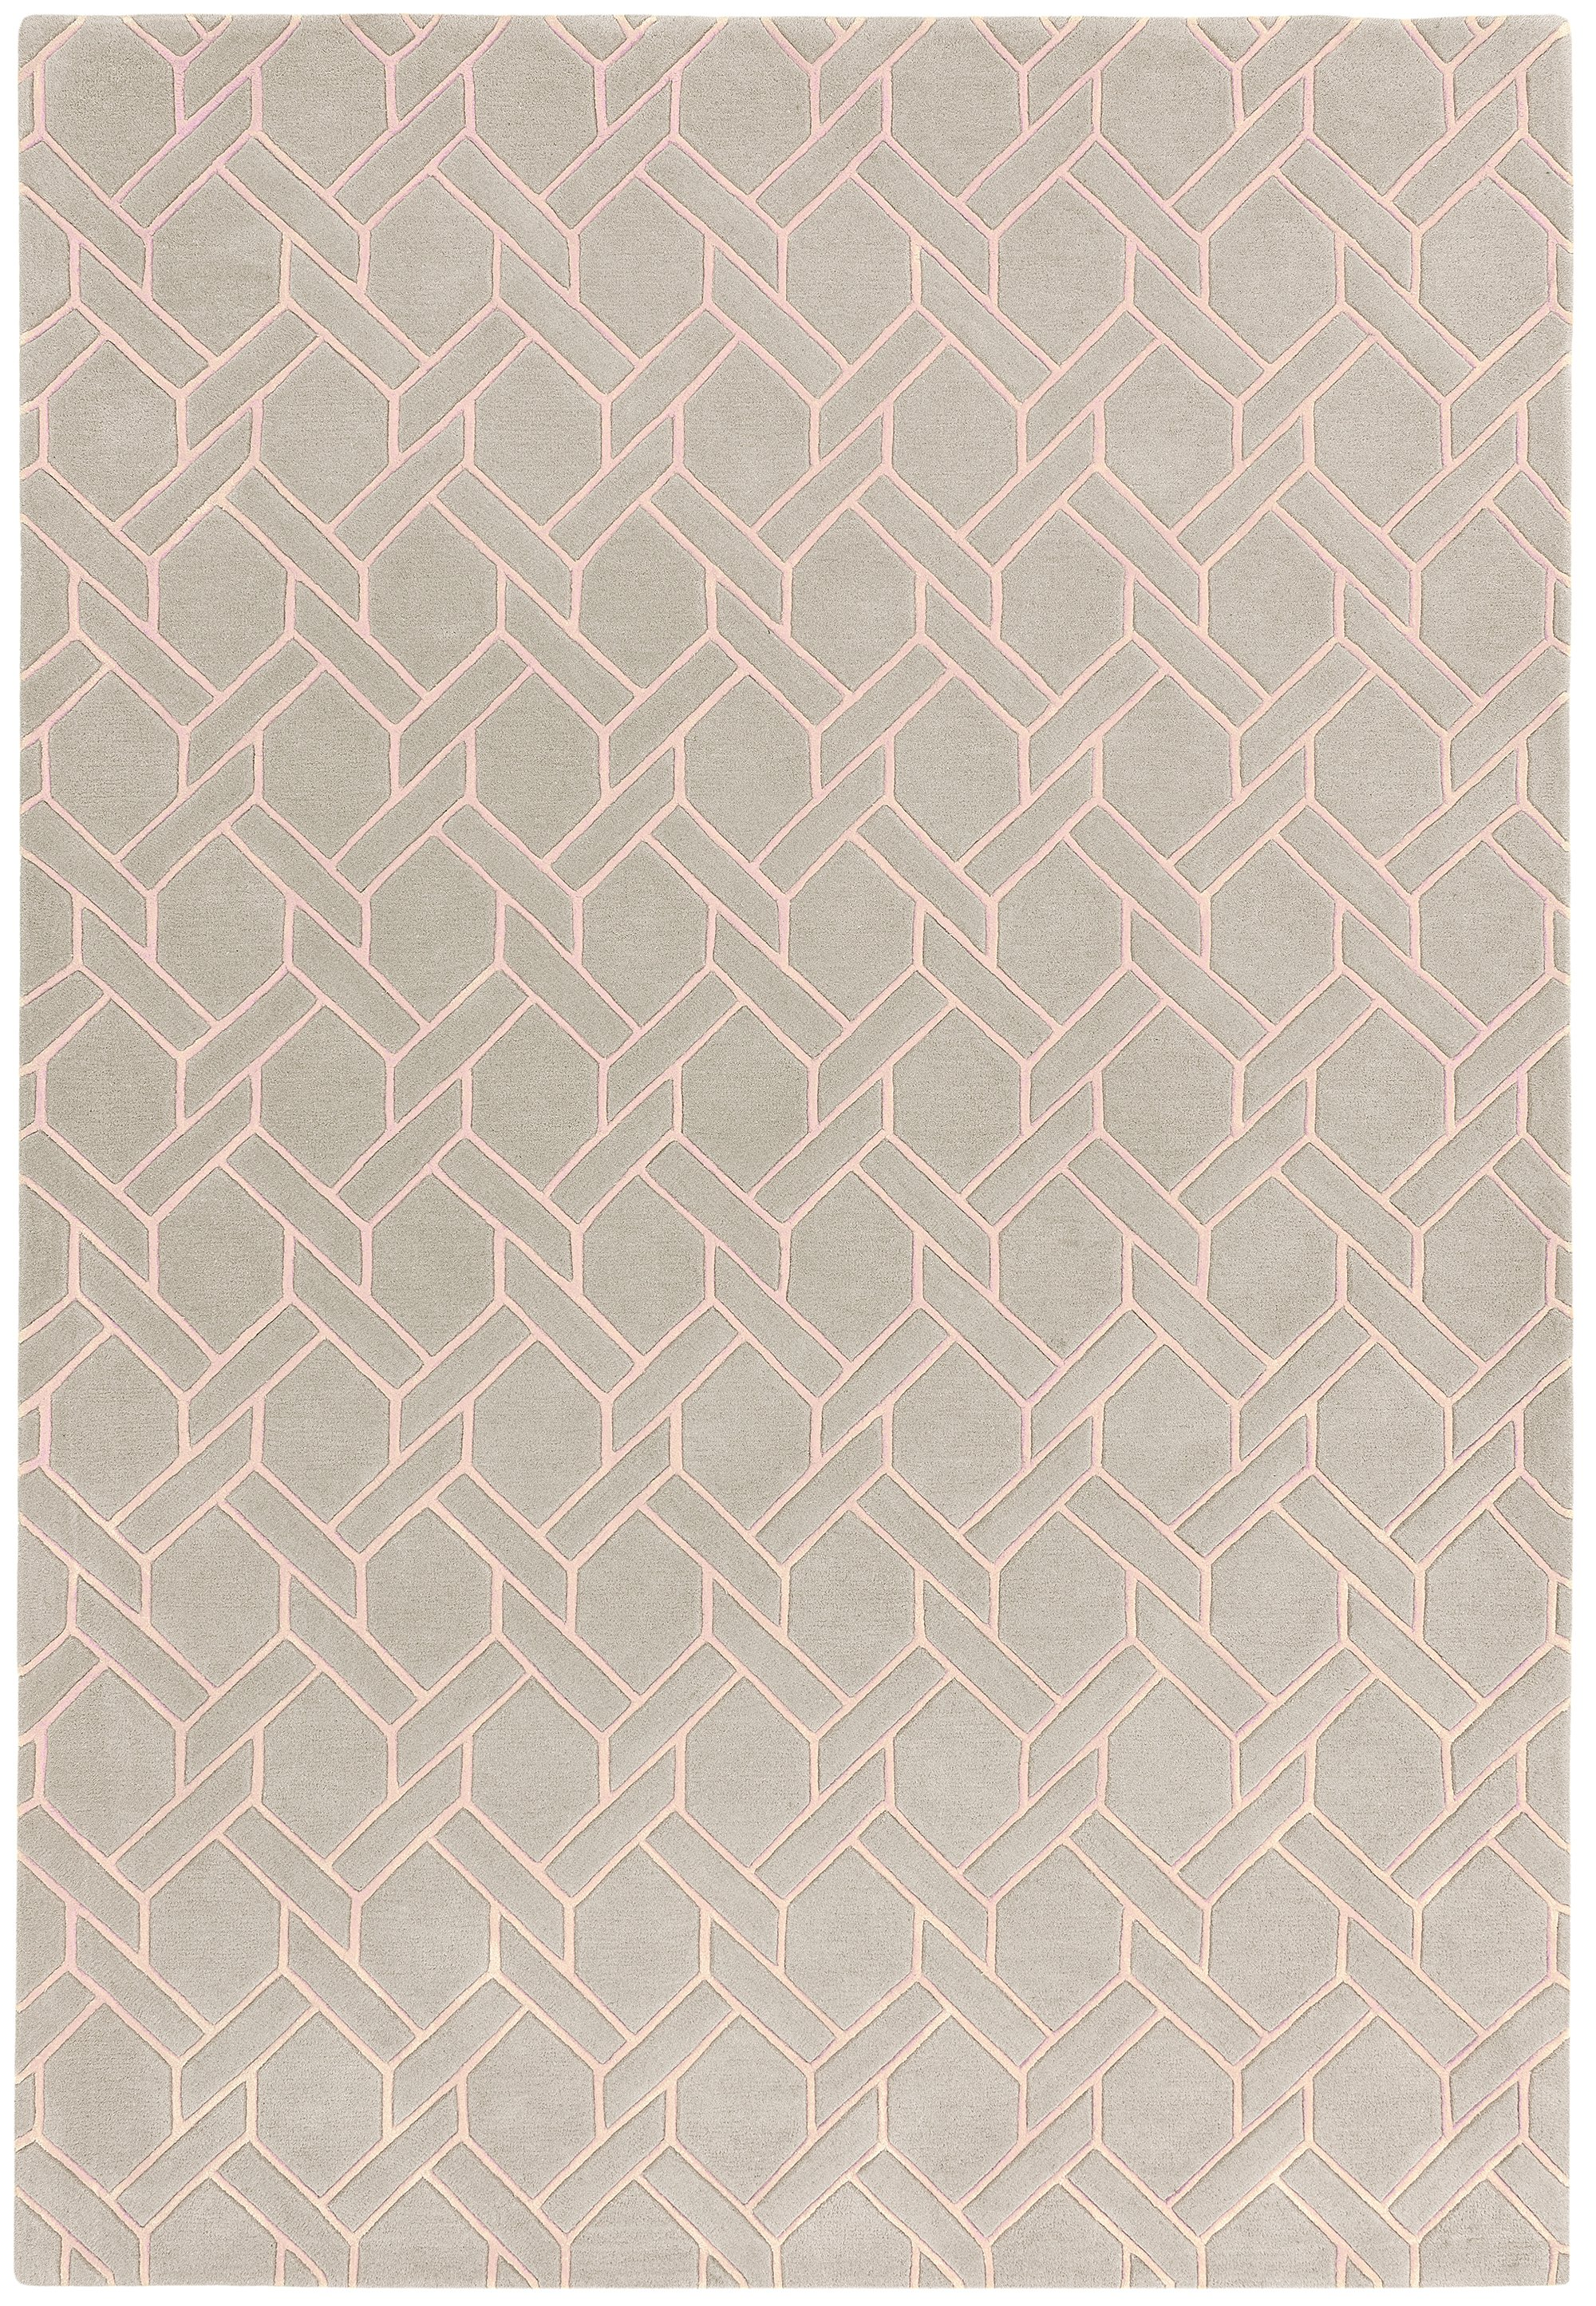 Nexus Rug Fine Lines Silver/Pink